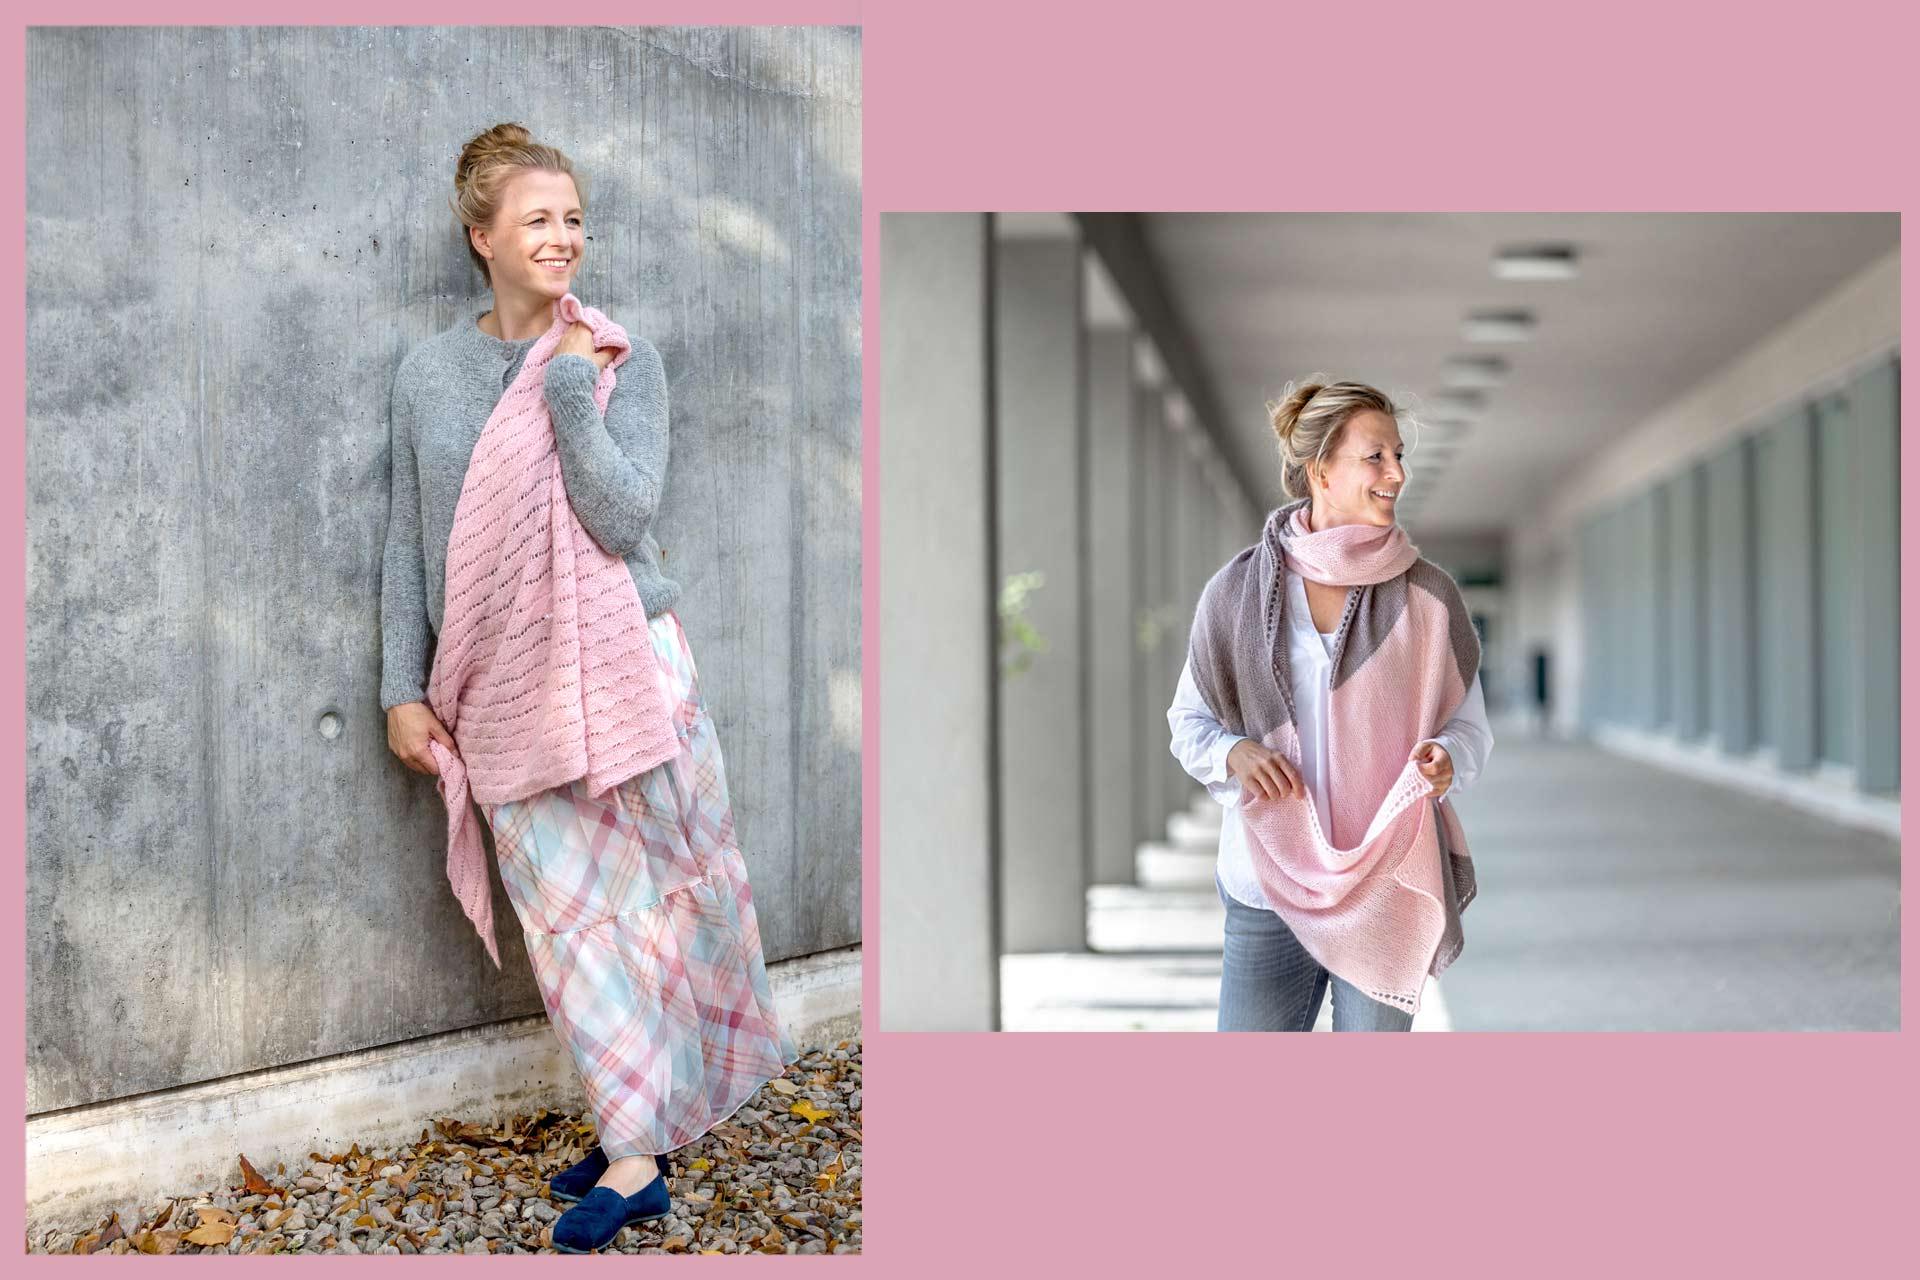 businessfotografie-rosa-farben-in-der-portraitfotografie-berlin